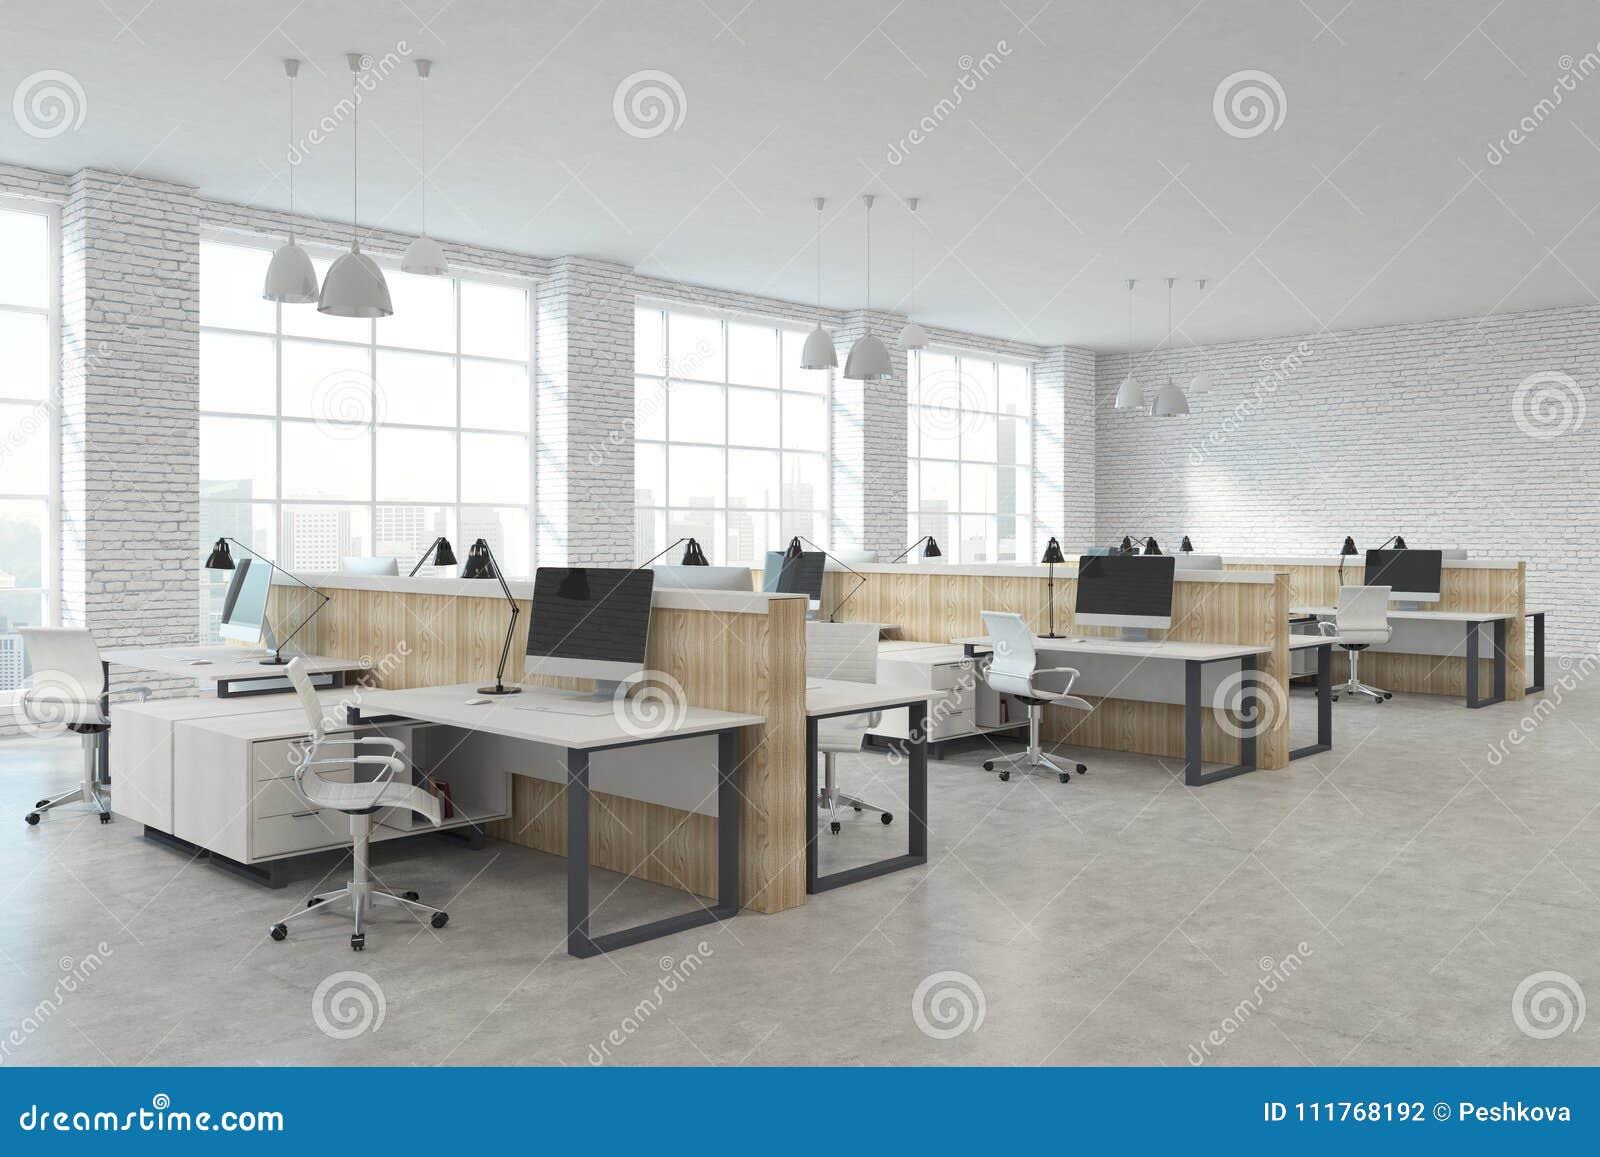 bureau coworking moderne photo stock image du contemporain 111768192. Black Bedroom Furniture Sets. Home Design Ideas